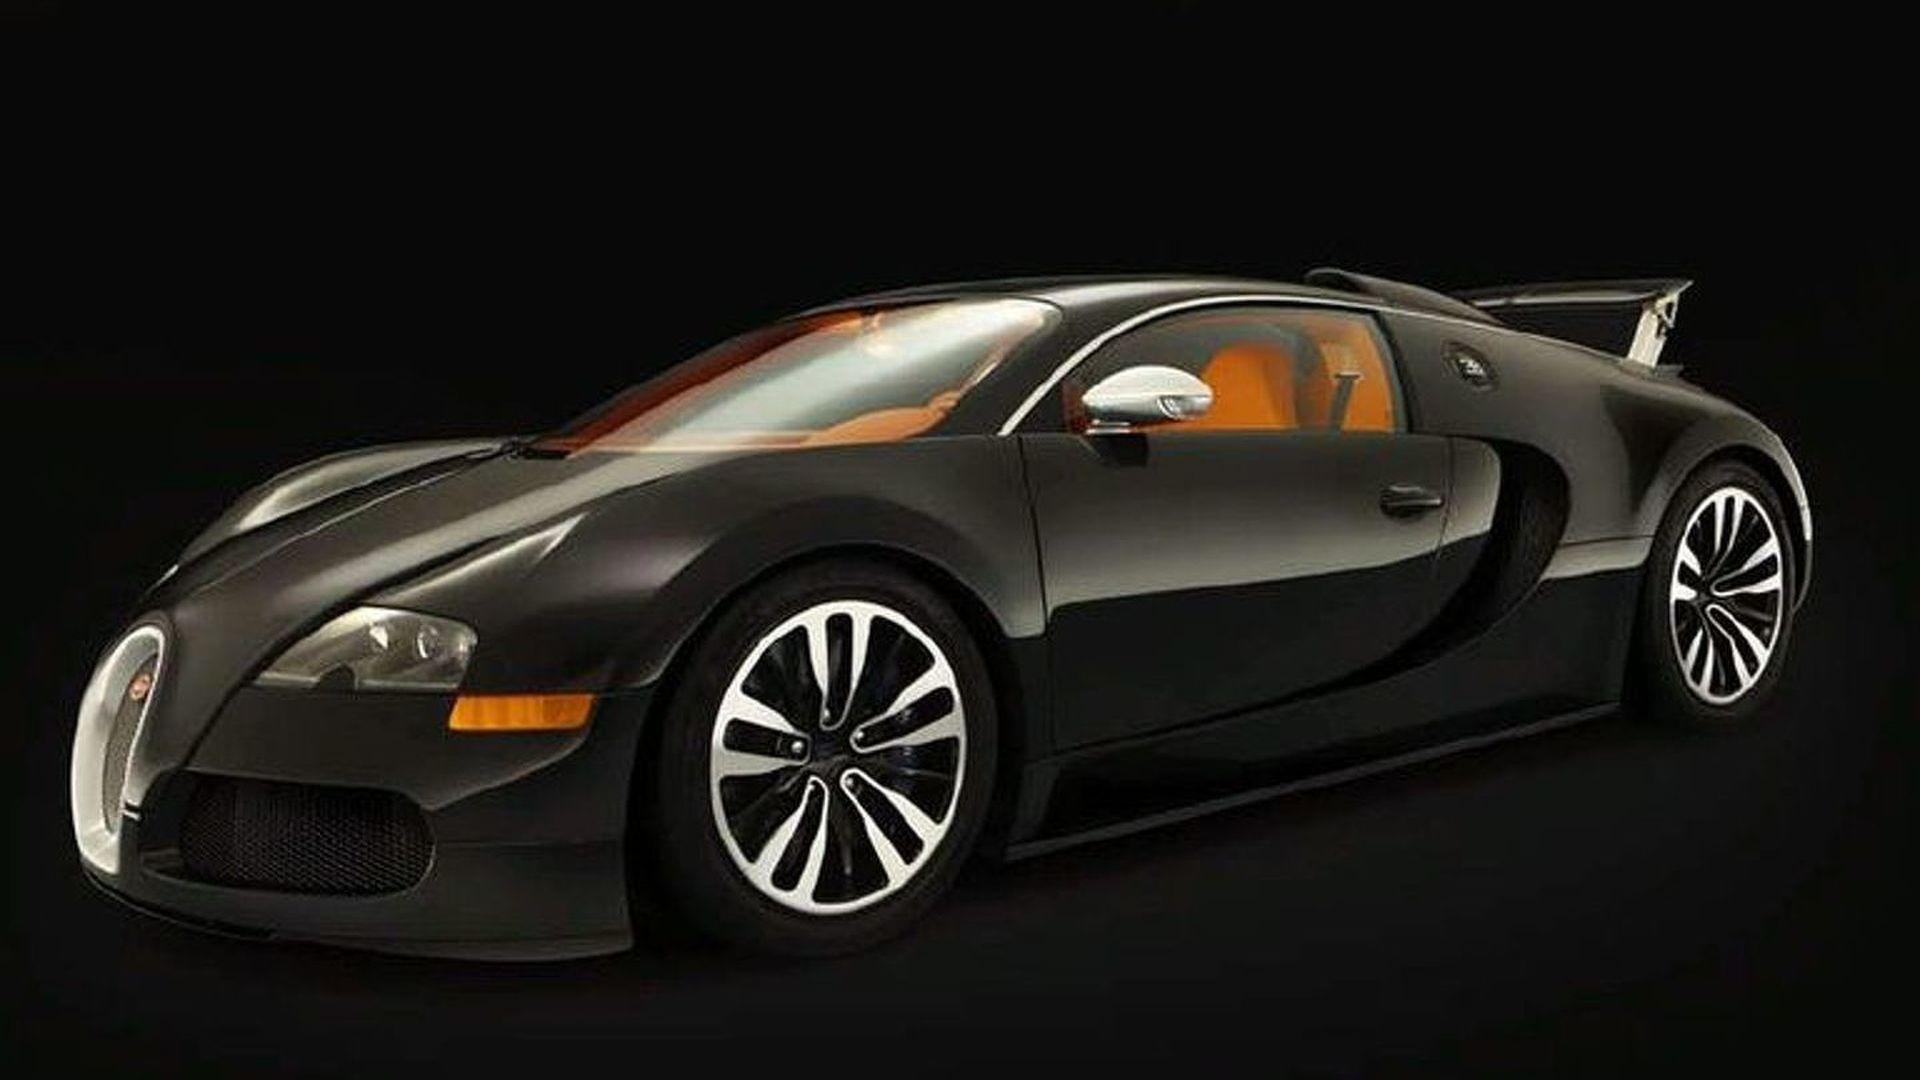 Bugatti Veyron Sang Noir Edition Revealed